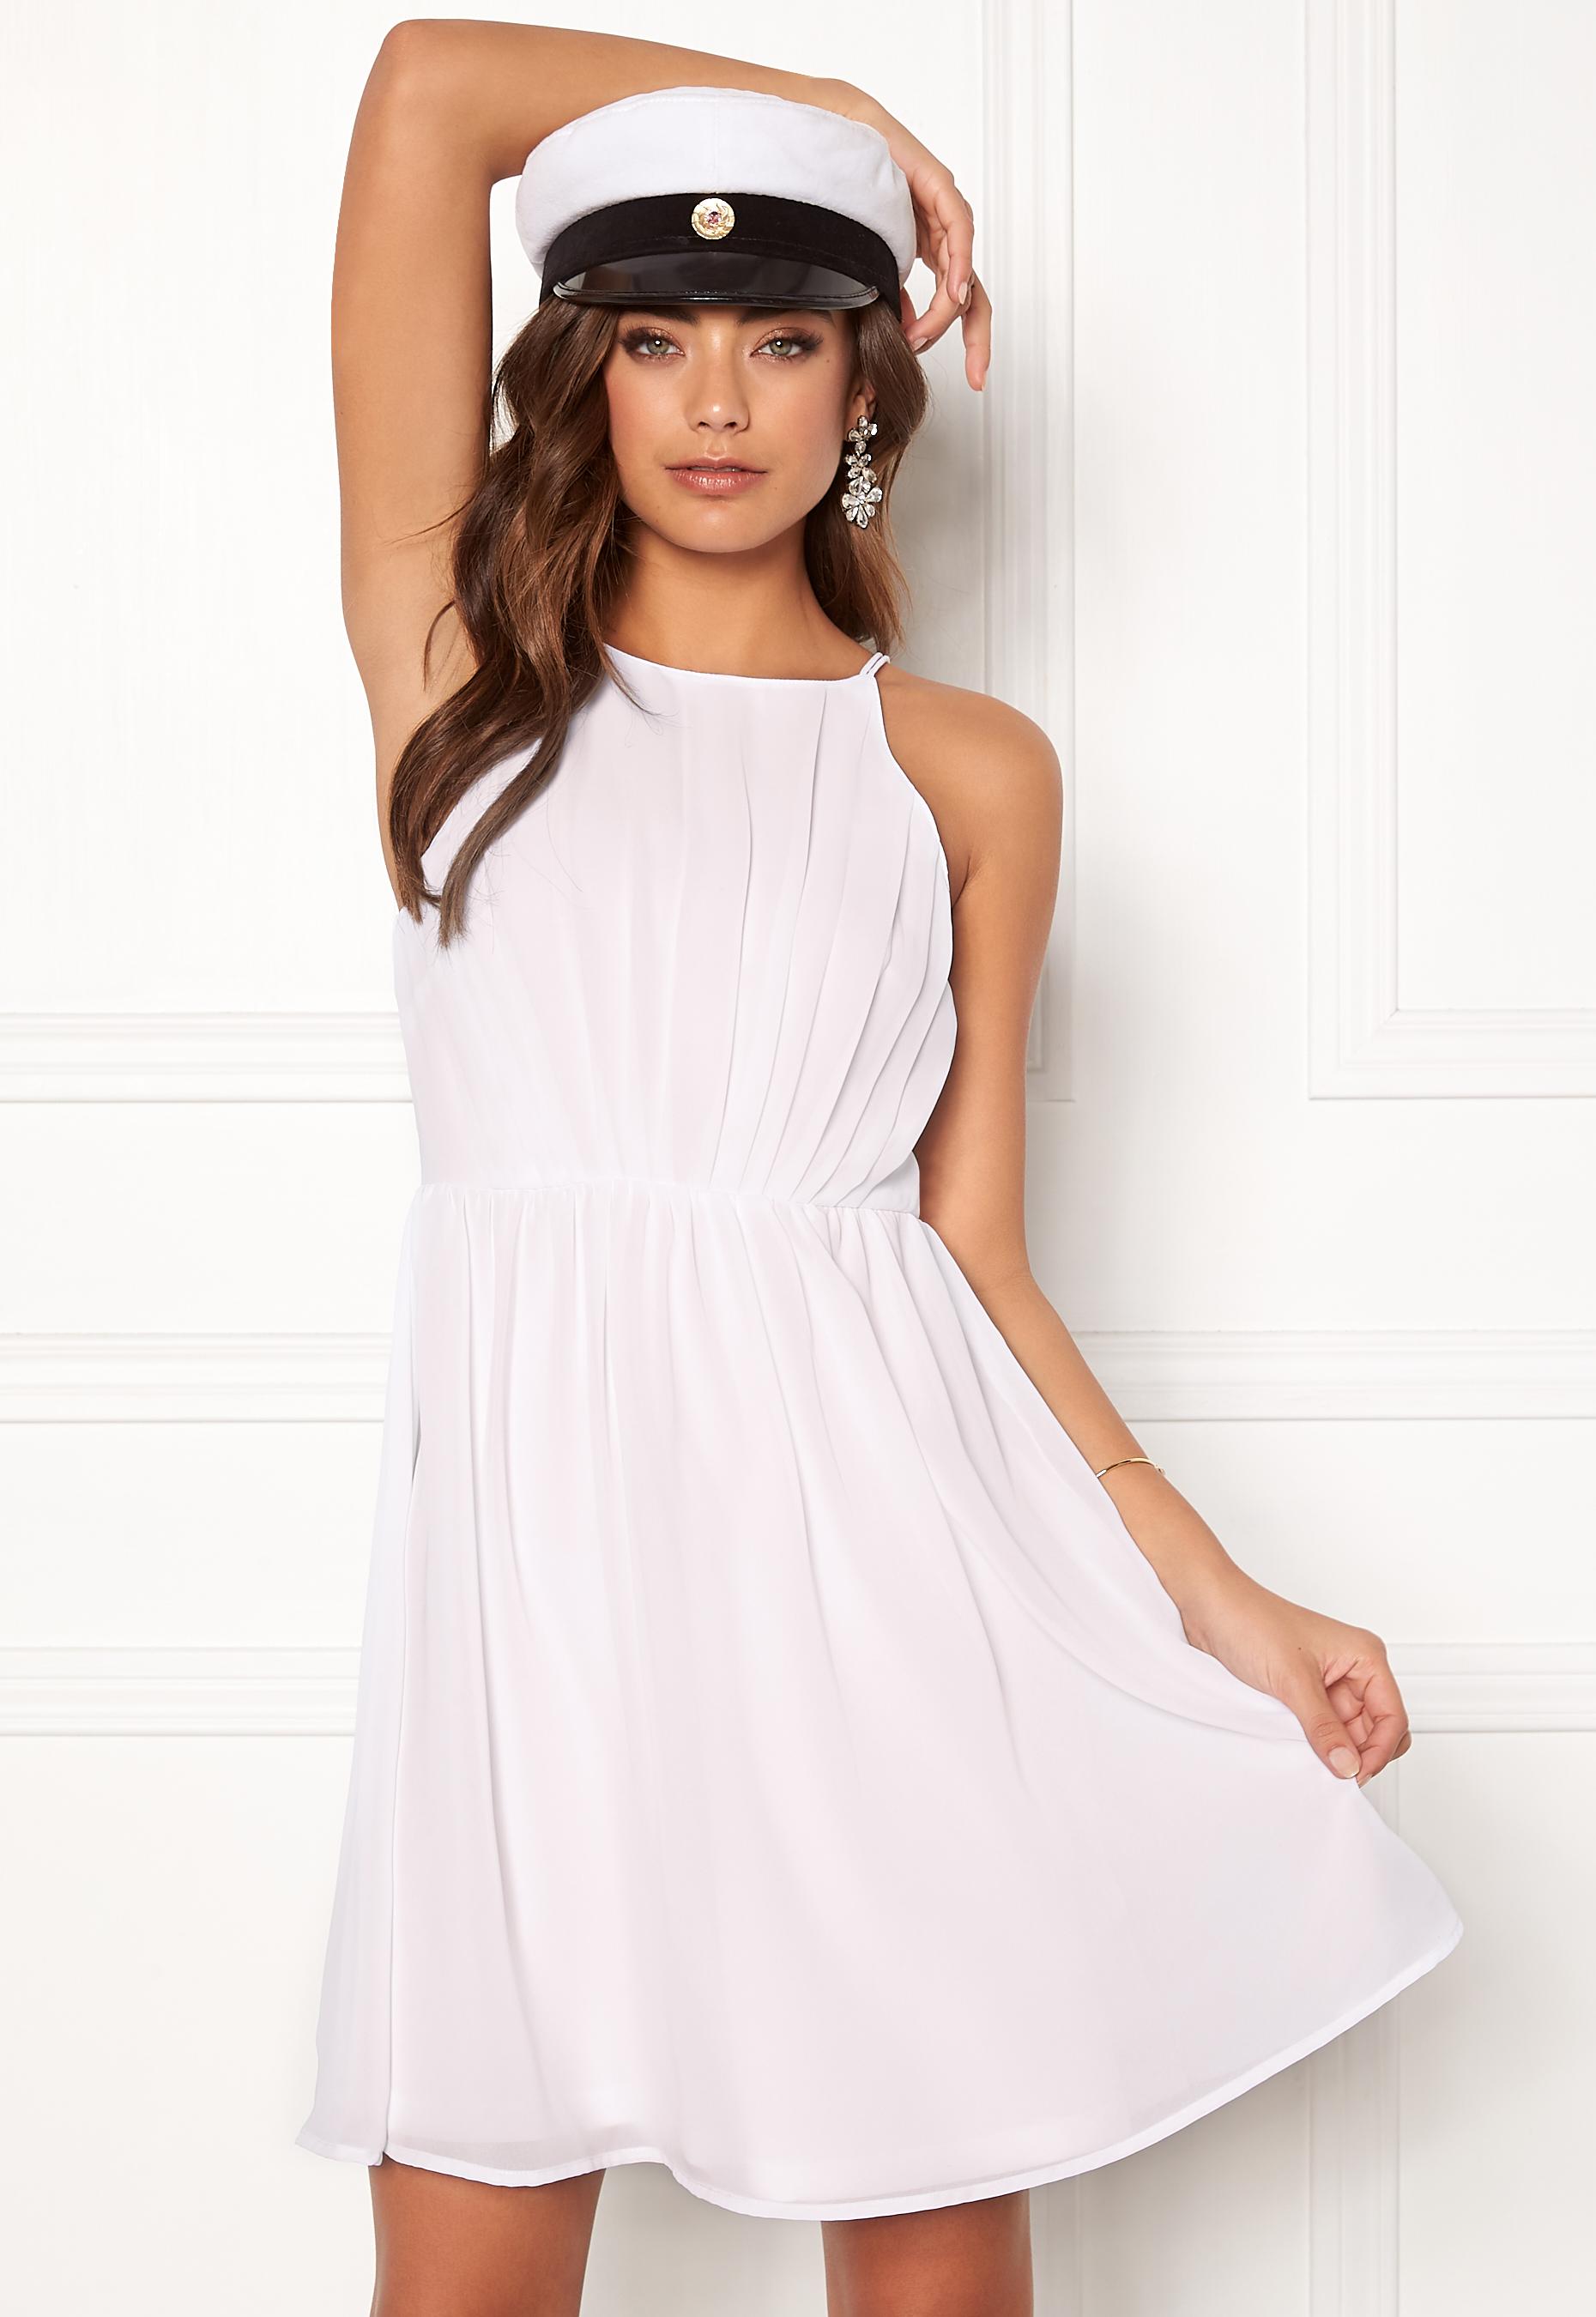 dd620003e096 Make Way Vania dress White - Bubbleroom